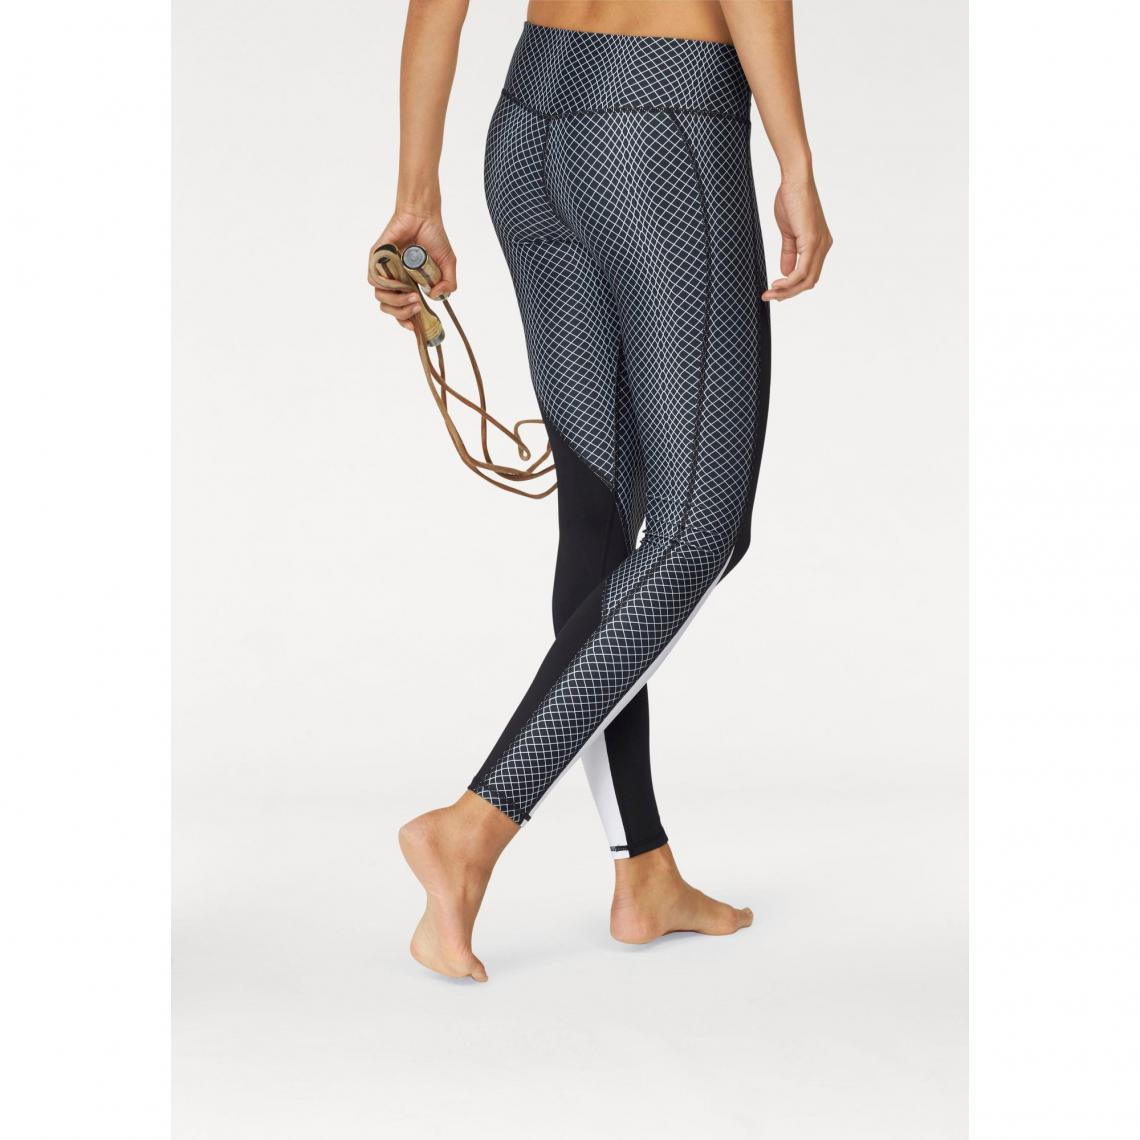 Puma Suisses Sport Tight Femme Legging Clash Noir3 1KJclF